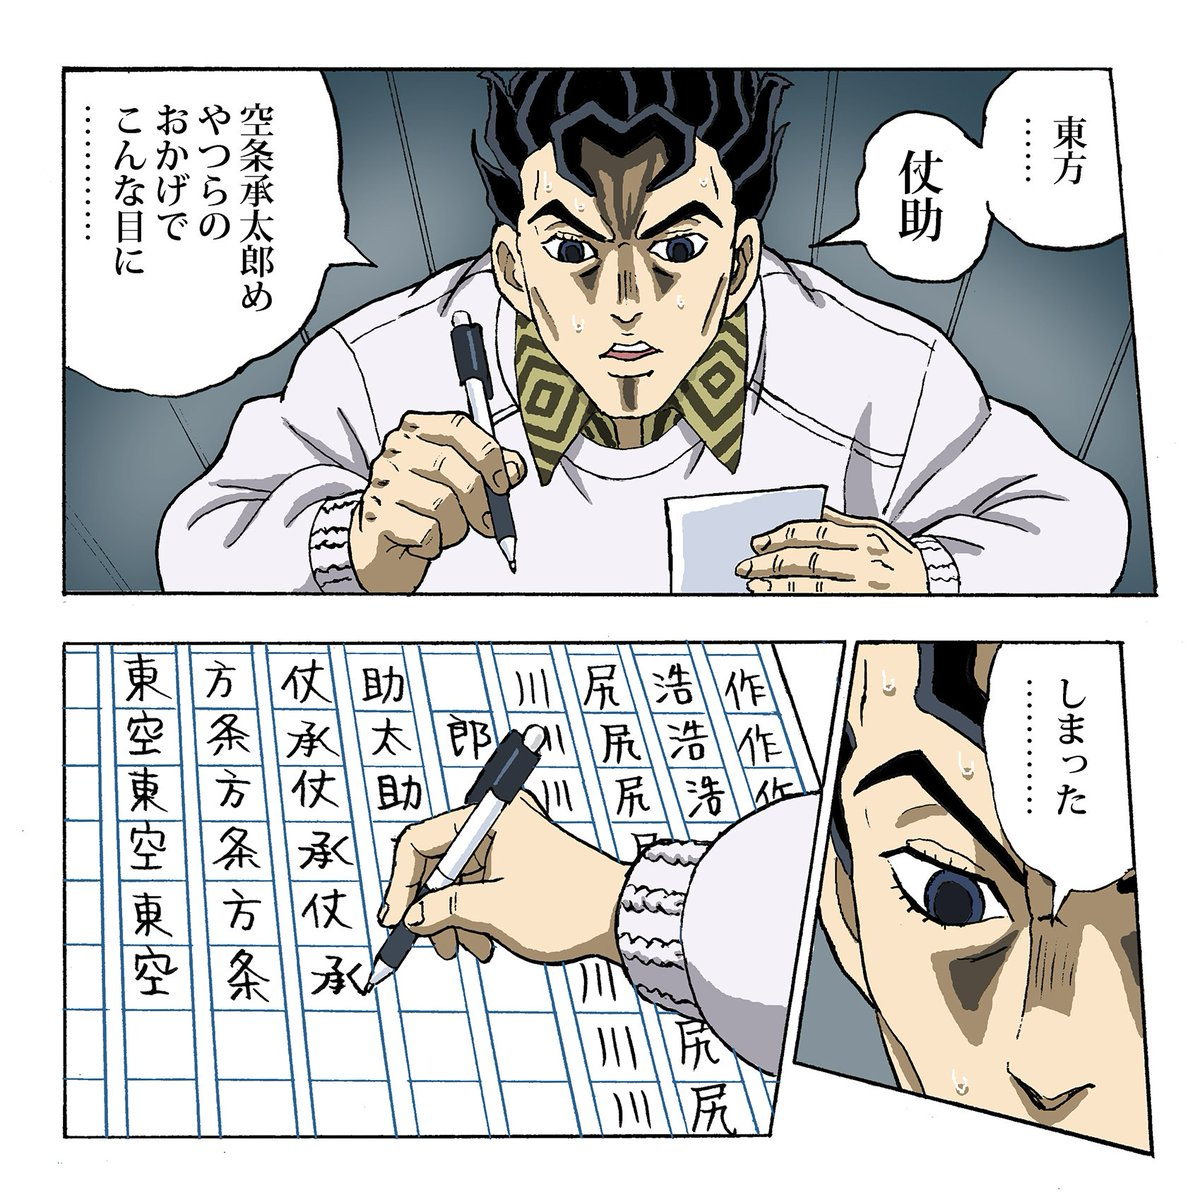 RT @fukuhara15: 書く文字を間違えたので0点 #達筆度診断 https://t.co/ZxMC9KsZpp